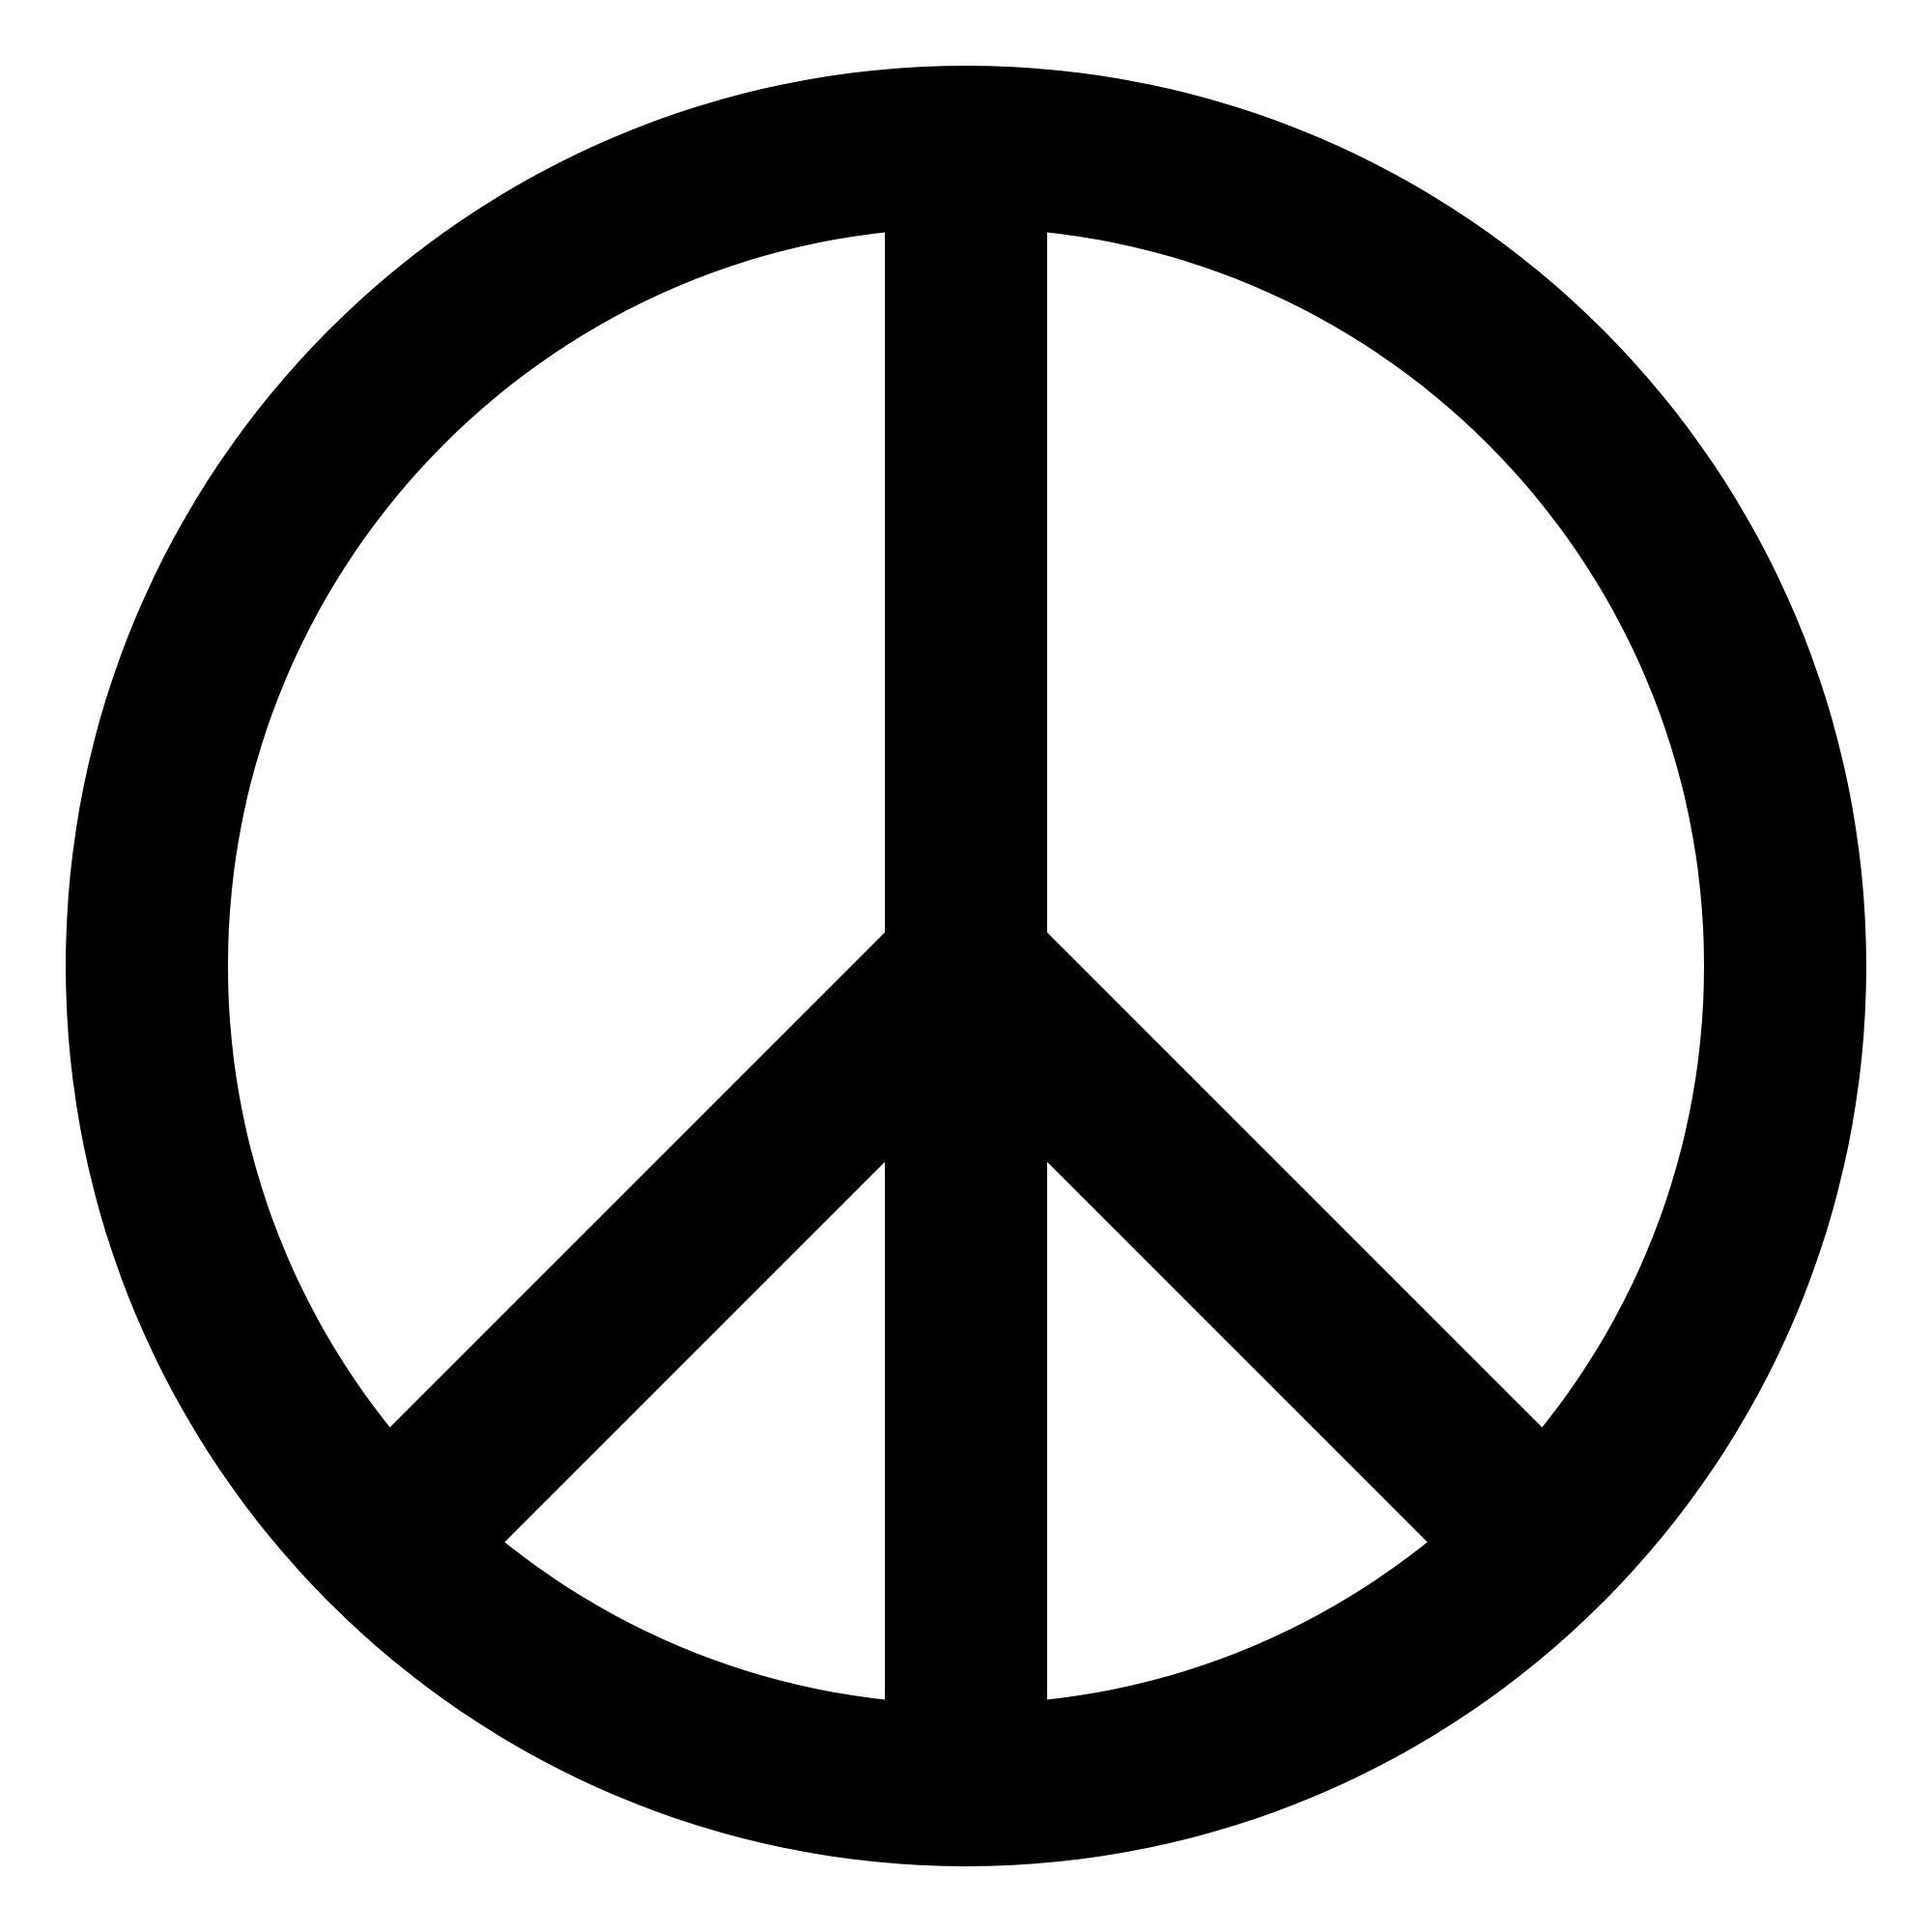 Symbol black transparent png. Peace clipart peace logo